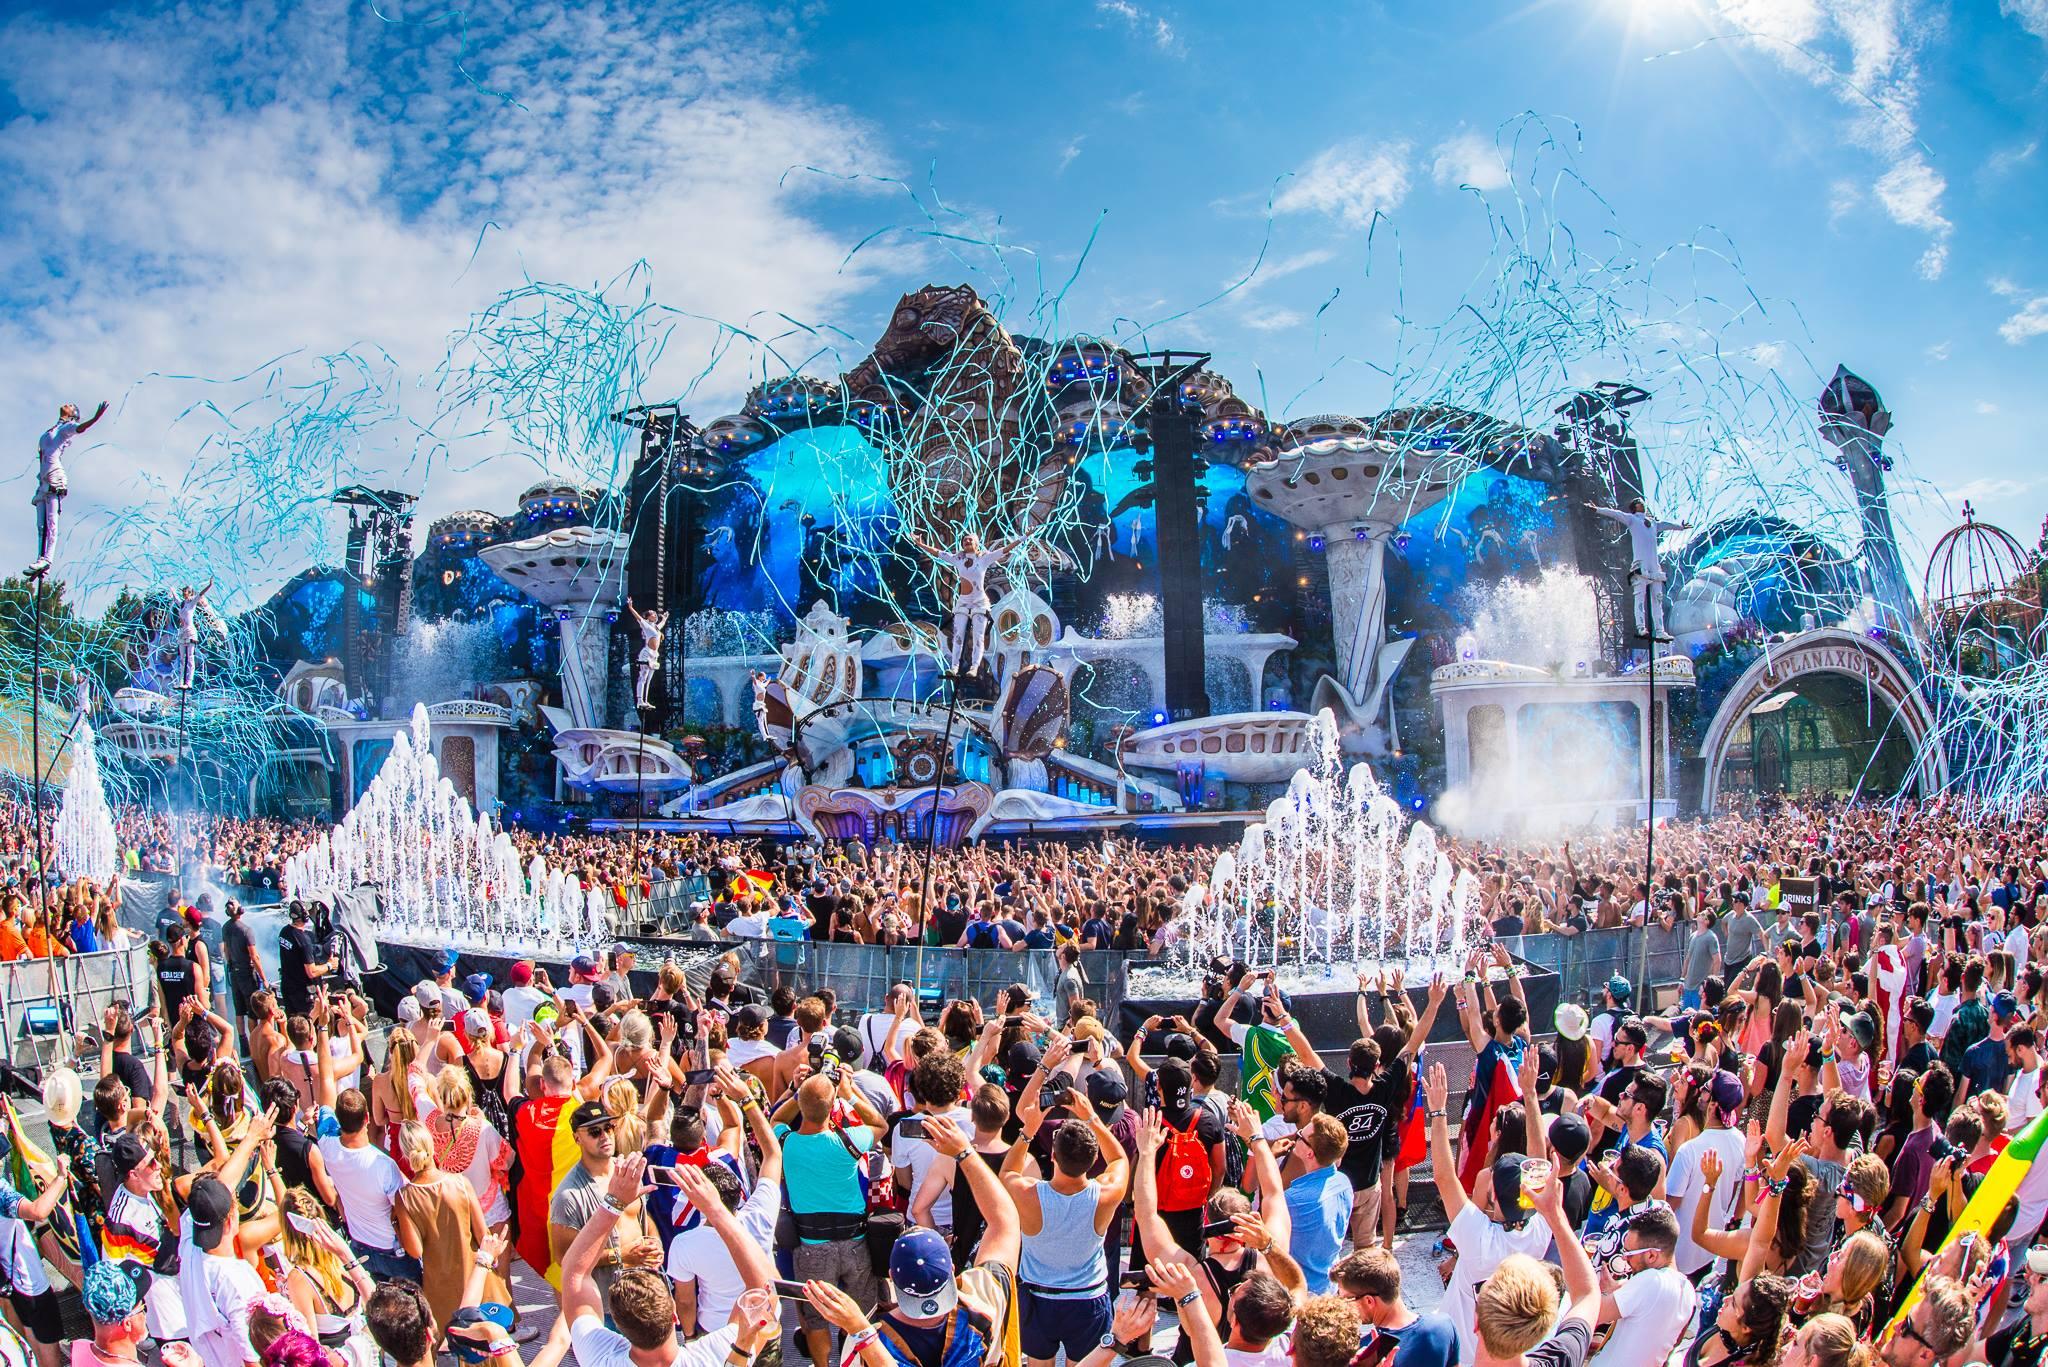 Tomorrowland 2018 Wallpapers - Top Free Tomorrowland 2018